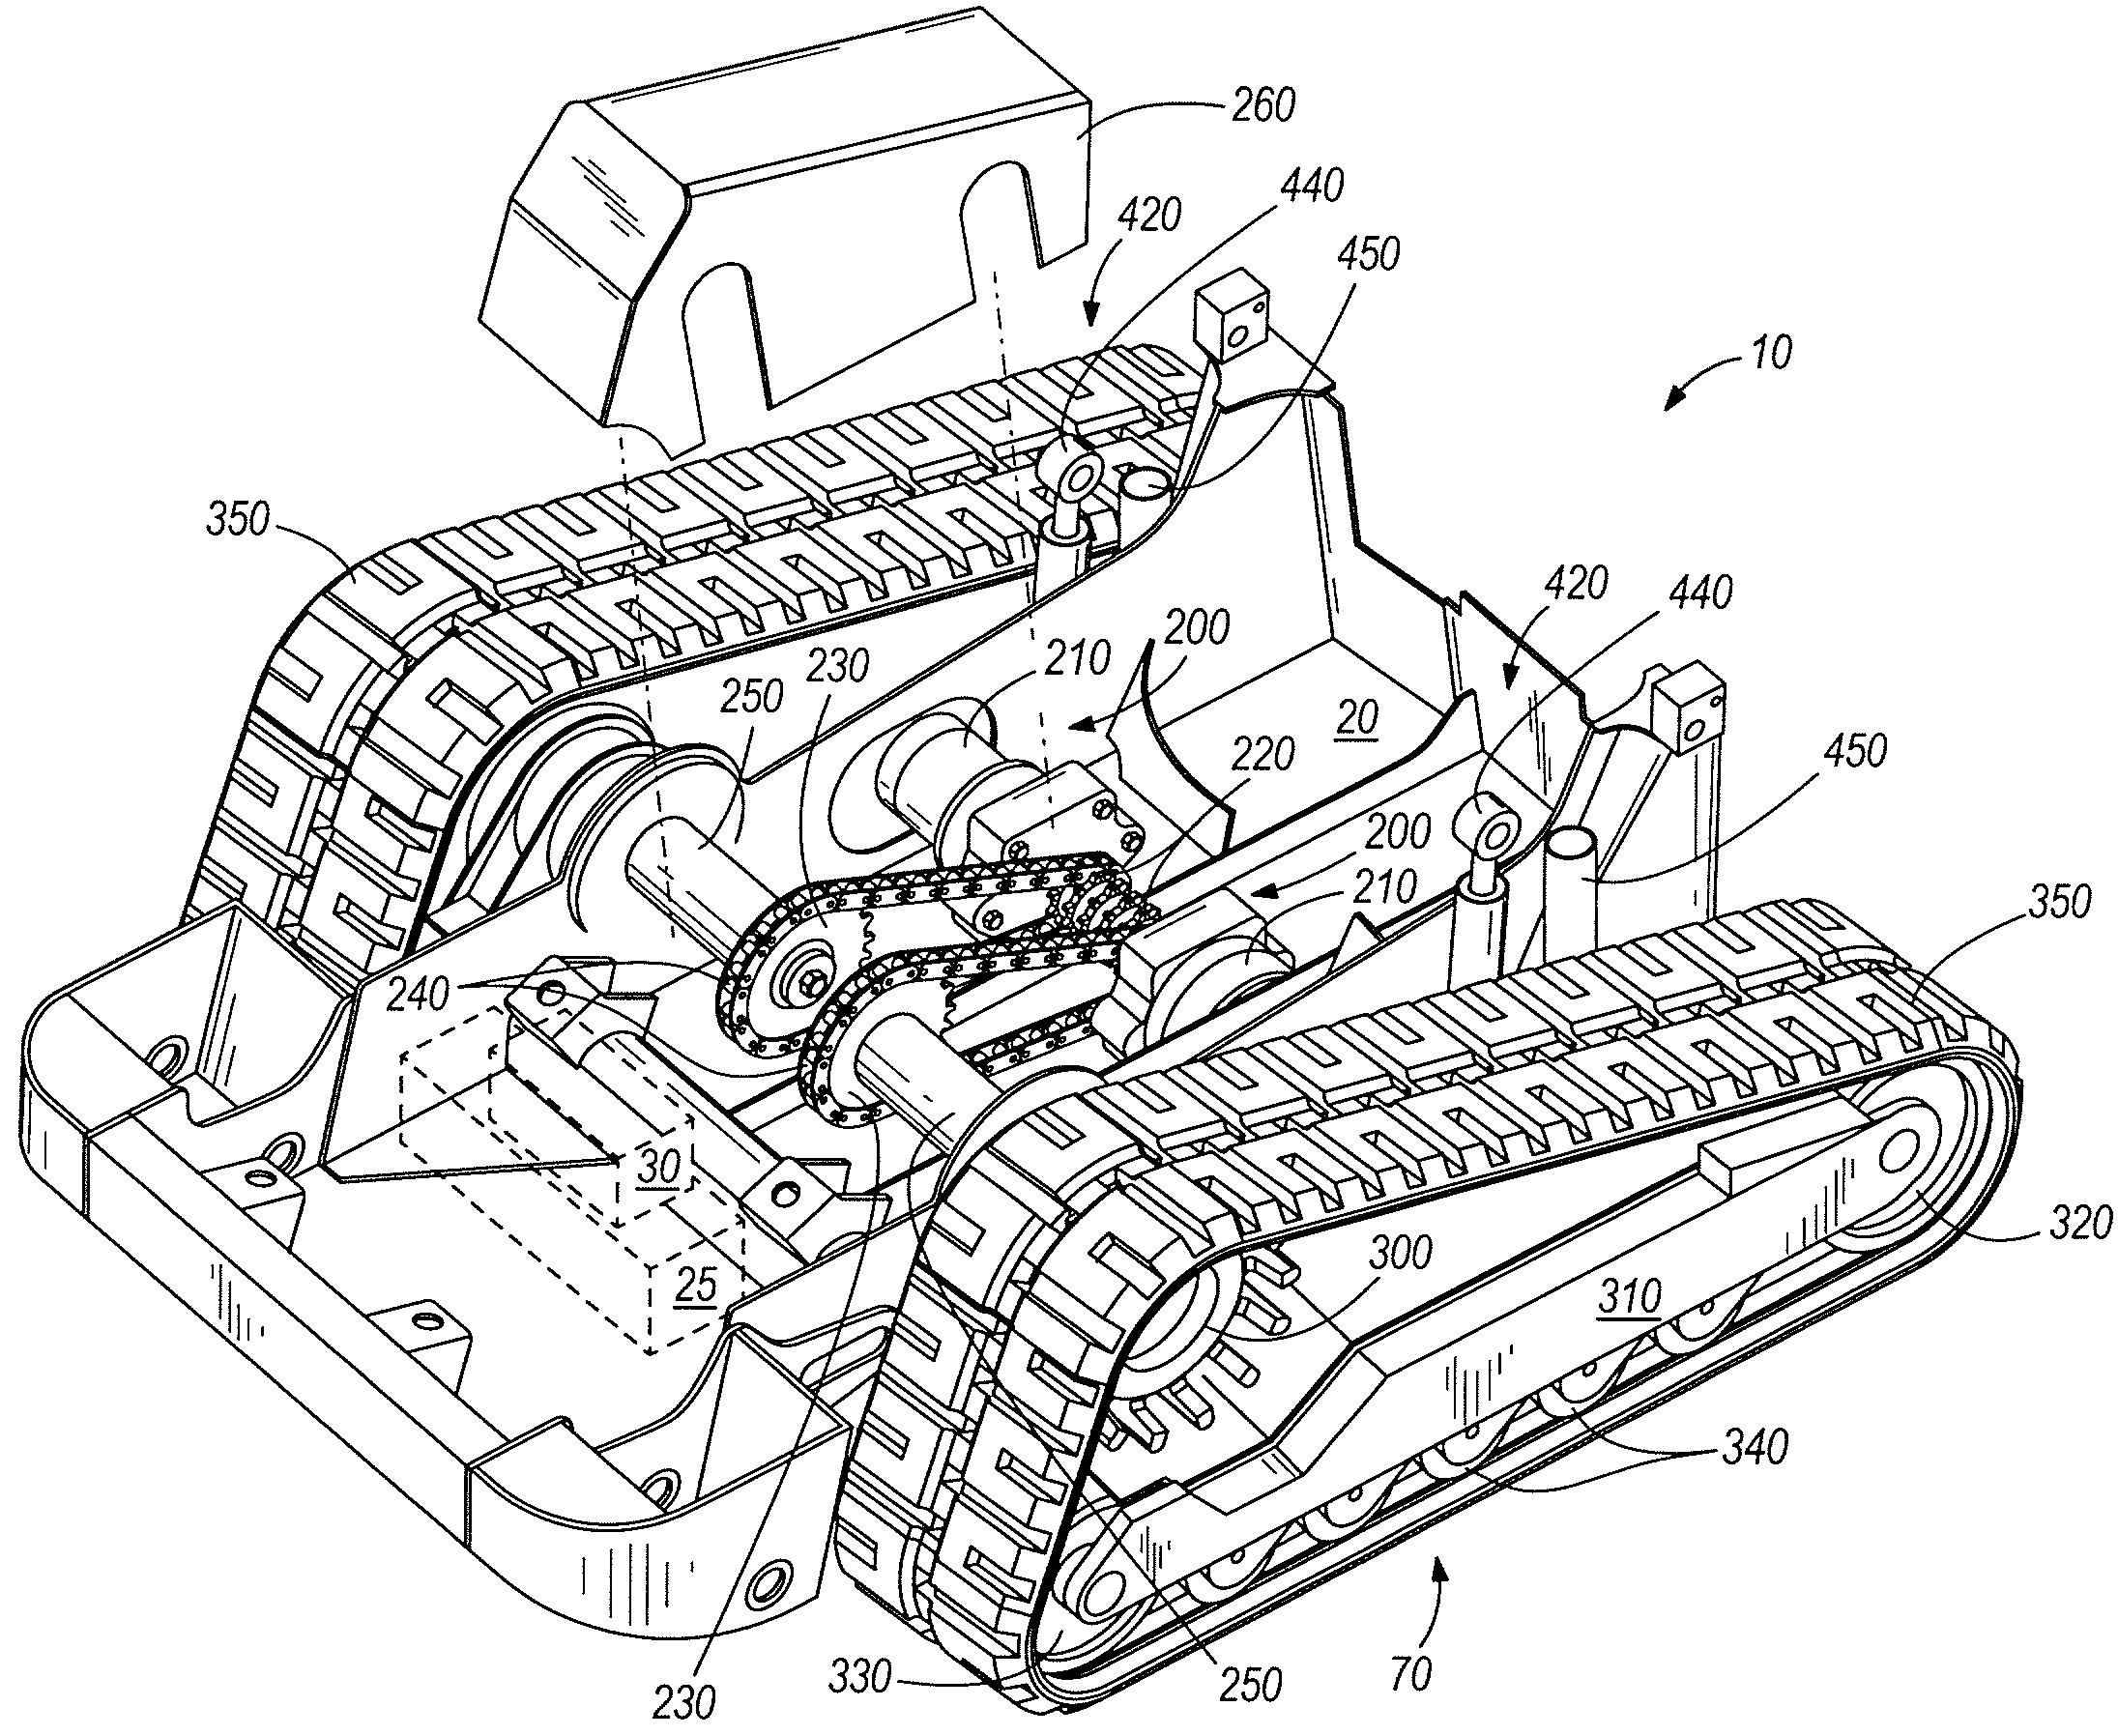 Image Result For Tracked Vehicle Design Robotank Inspiration John Deere Alternator Wiring Diagram 15 Mini Exc